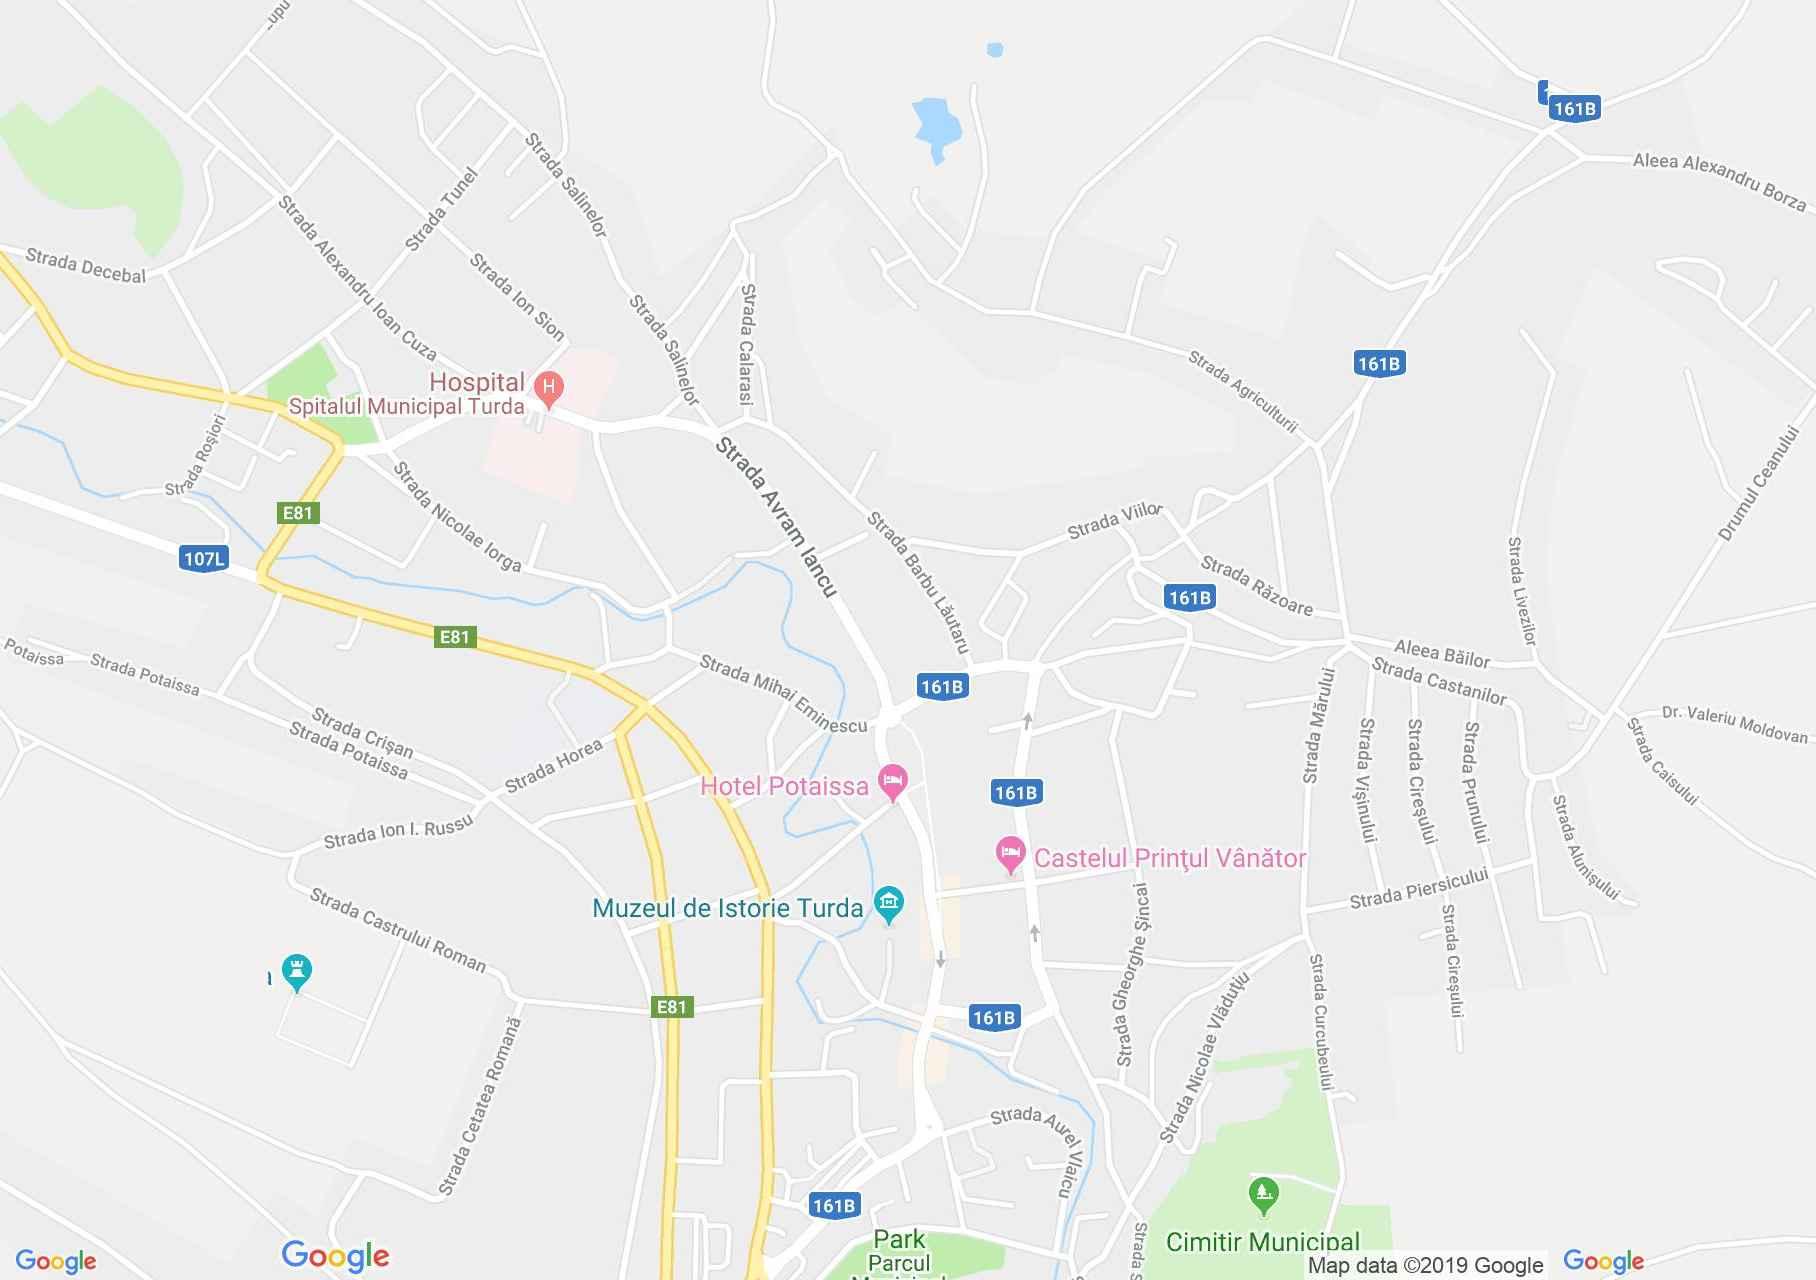 Map of Turda: Lapidary